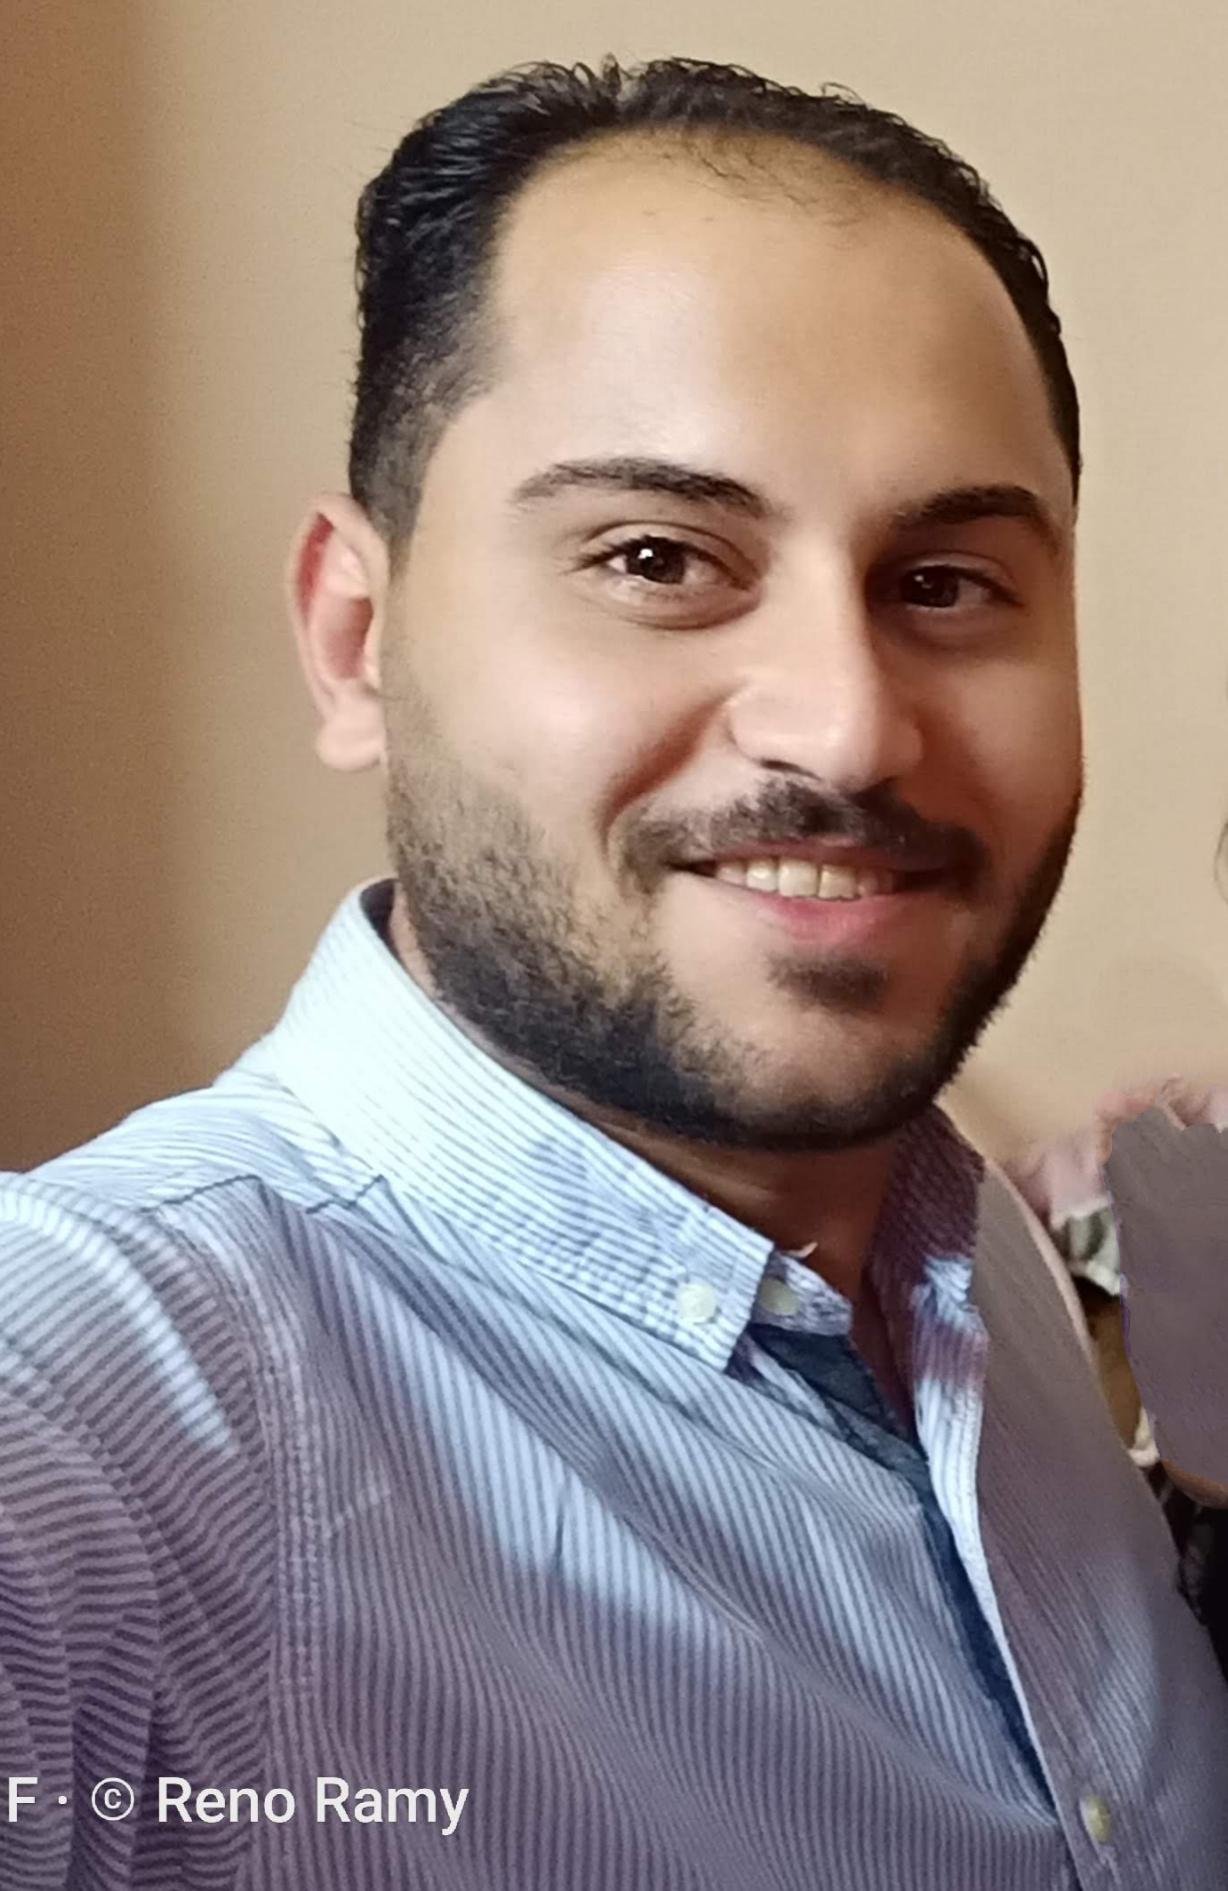 Gergis Moawad